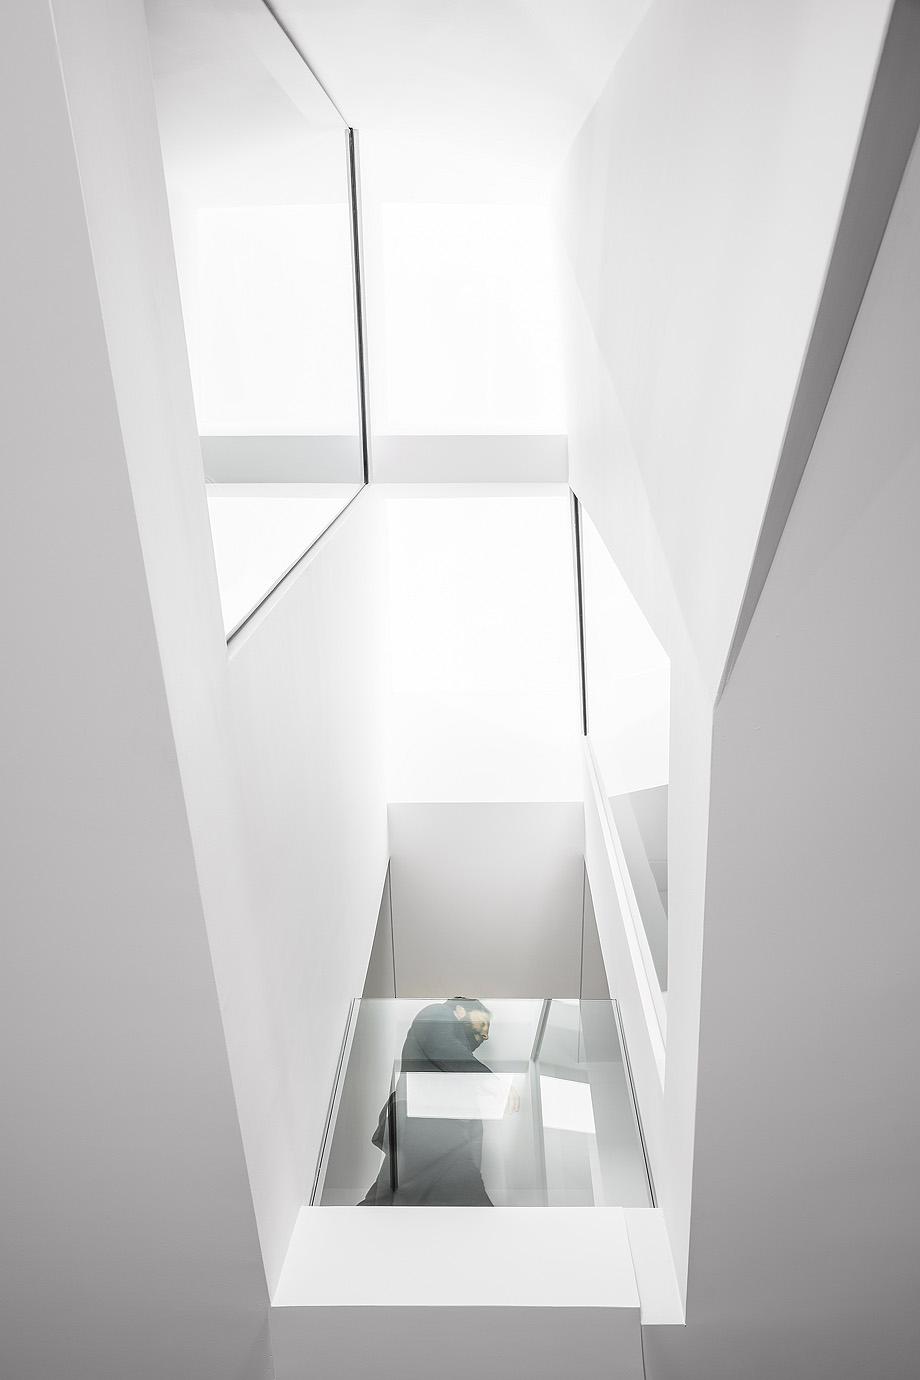 casa tesseract de phaedrus studio - foto ryan fung (10)